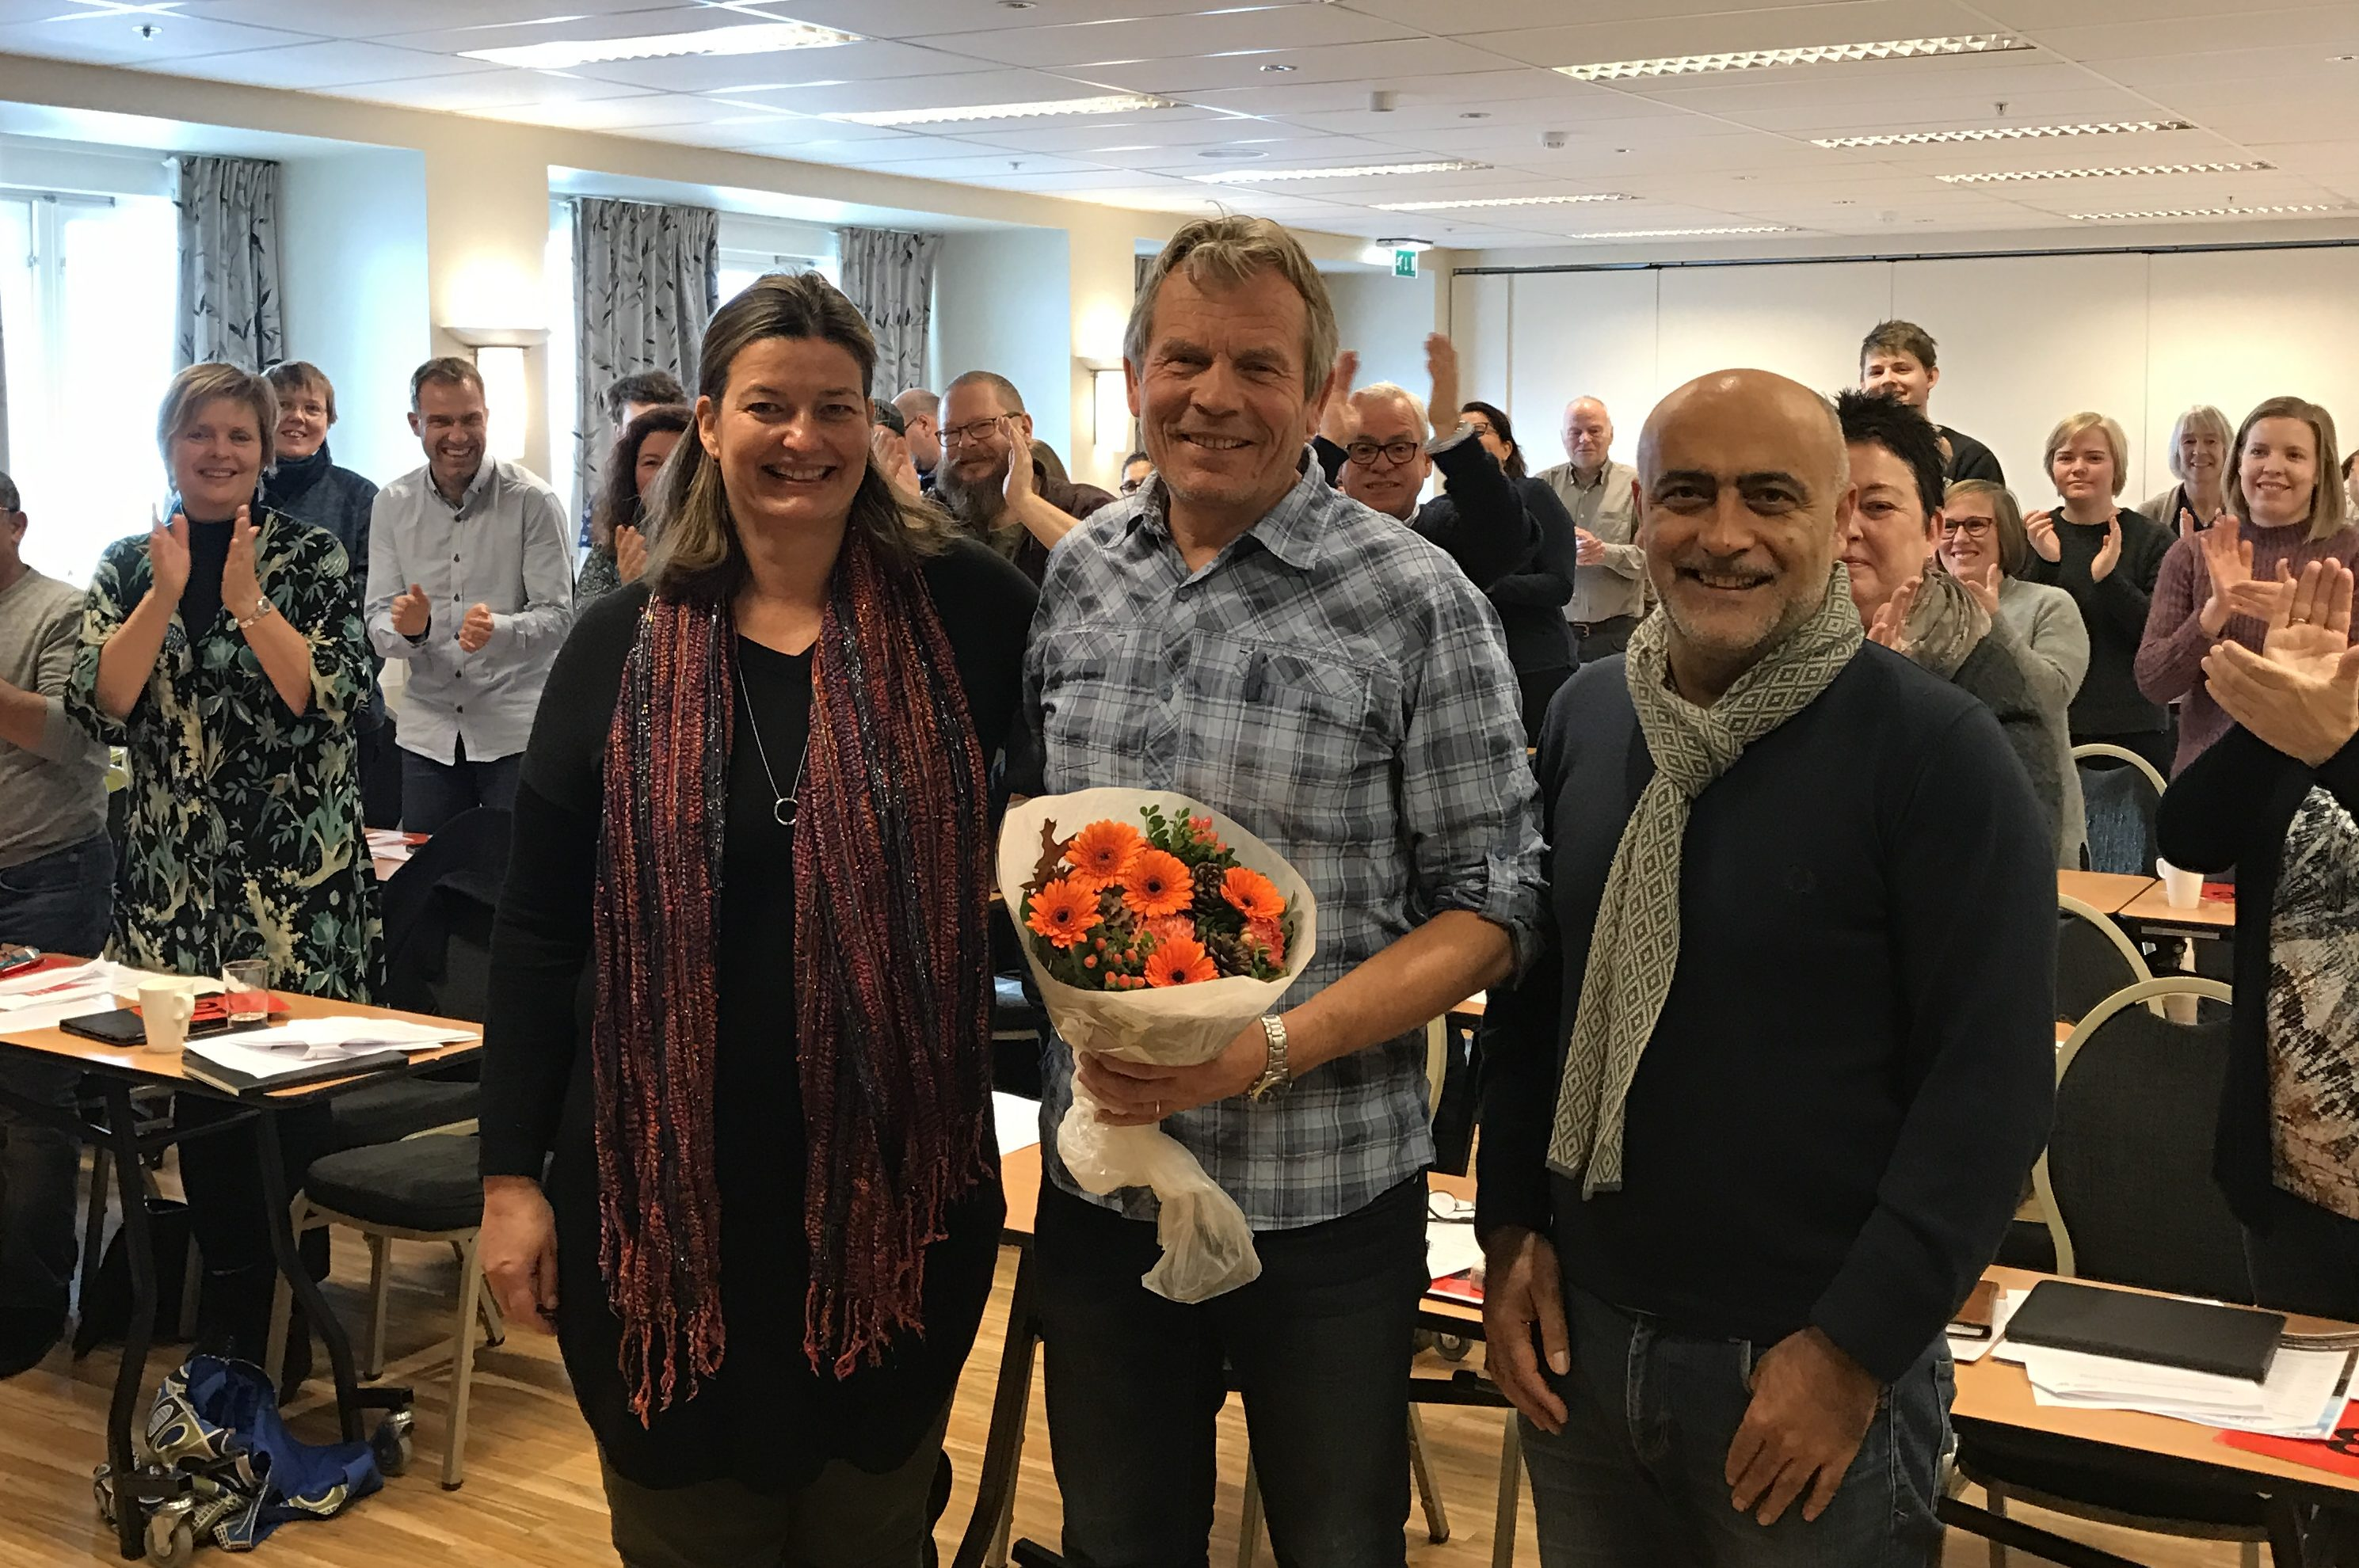 Arne Nævra topper Buskerud SVs stortingsliste